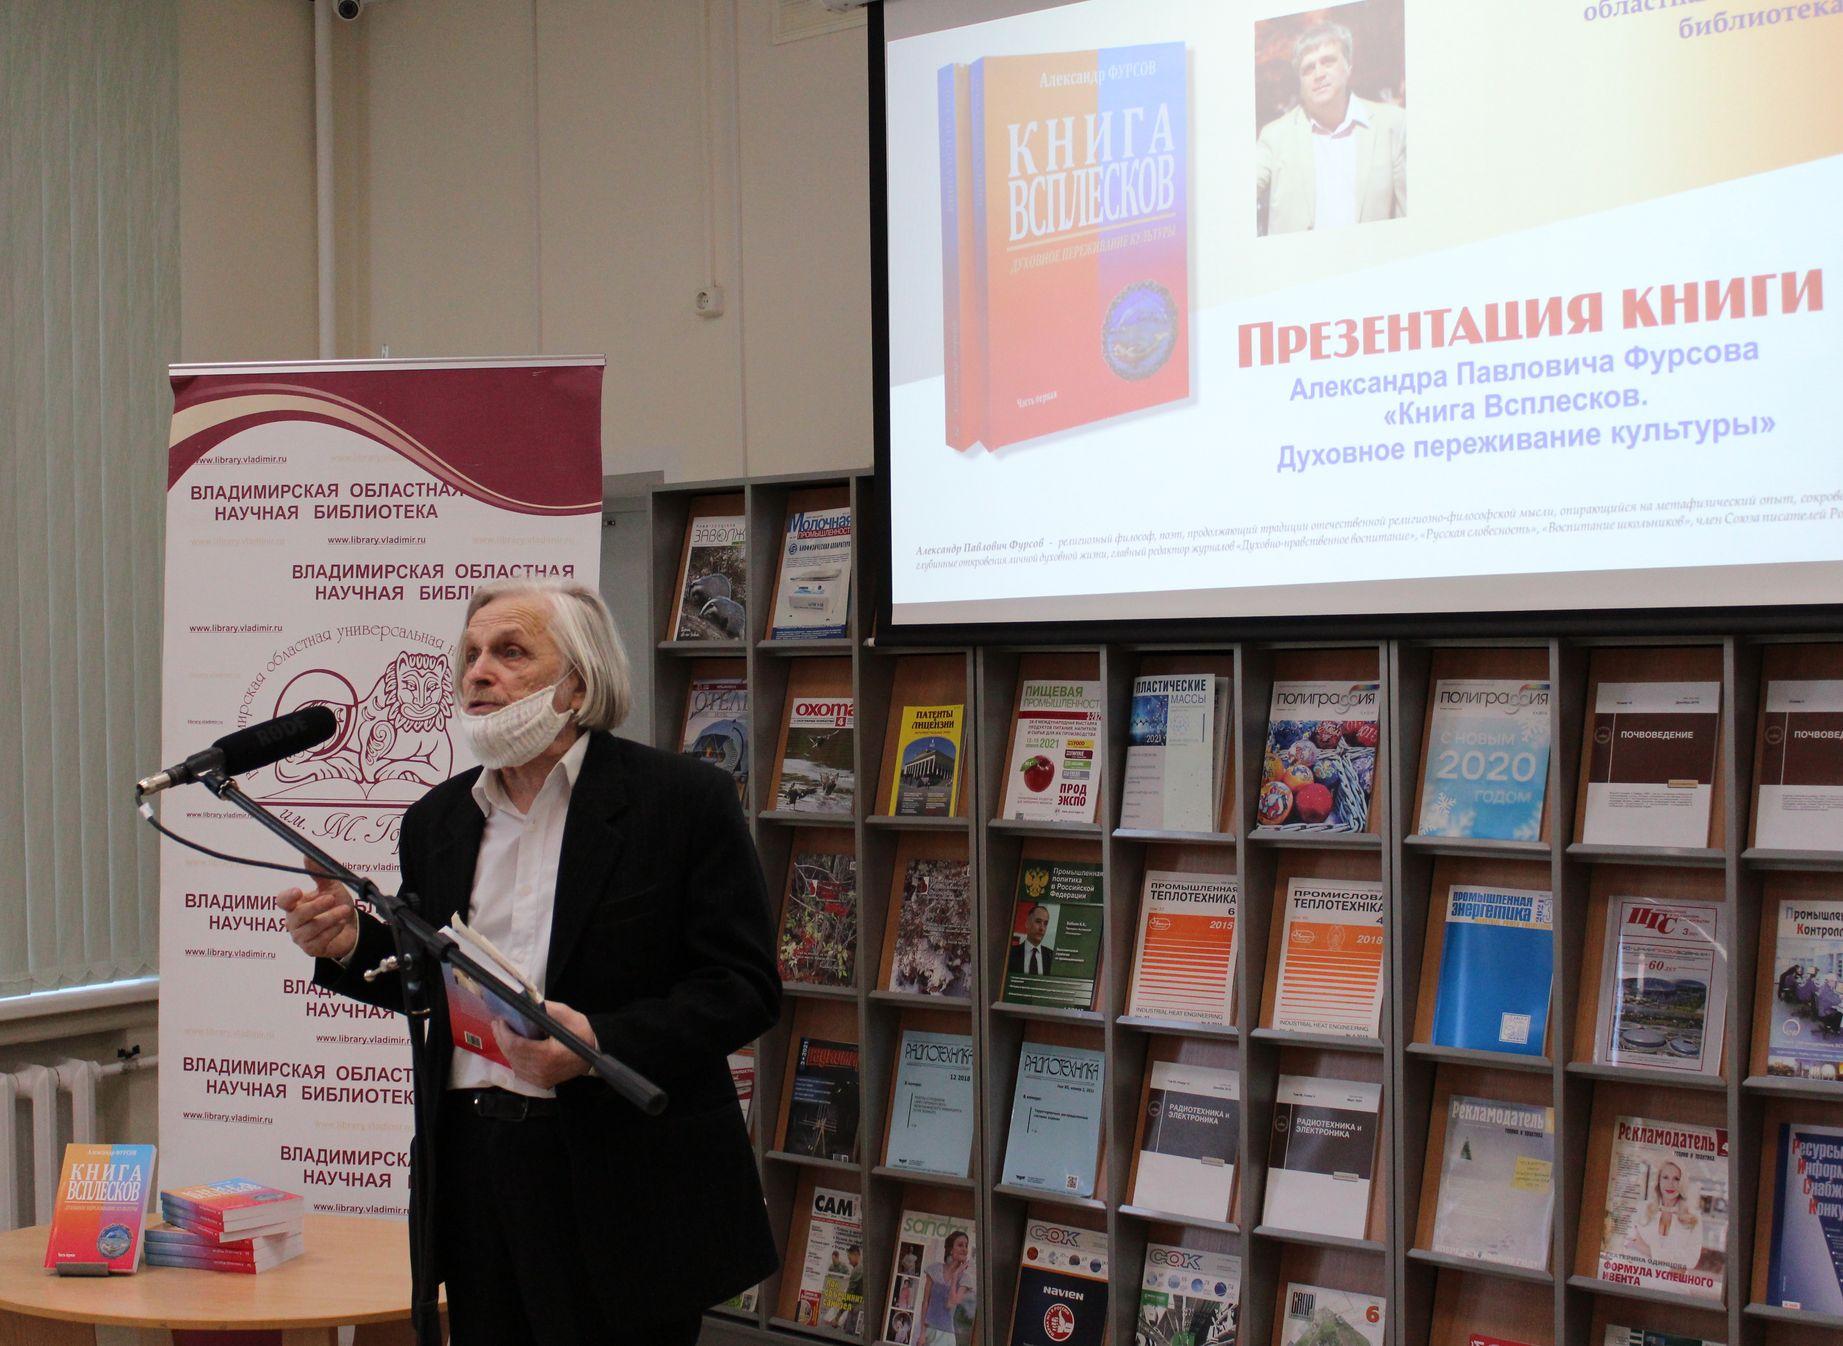 Поэт и педагог Вячеслав Улитин